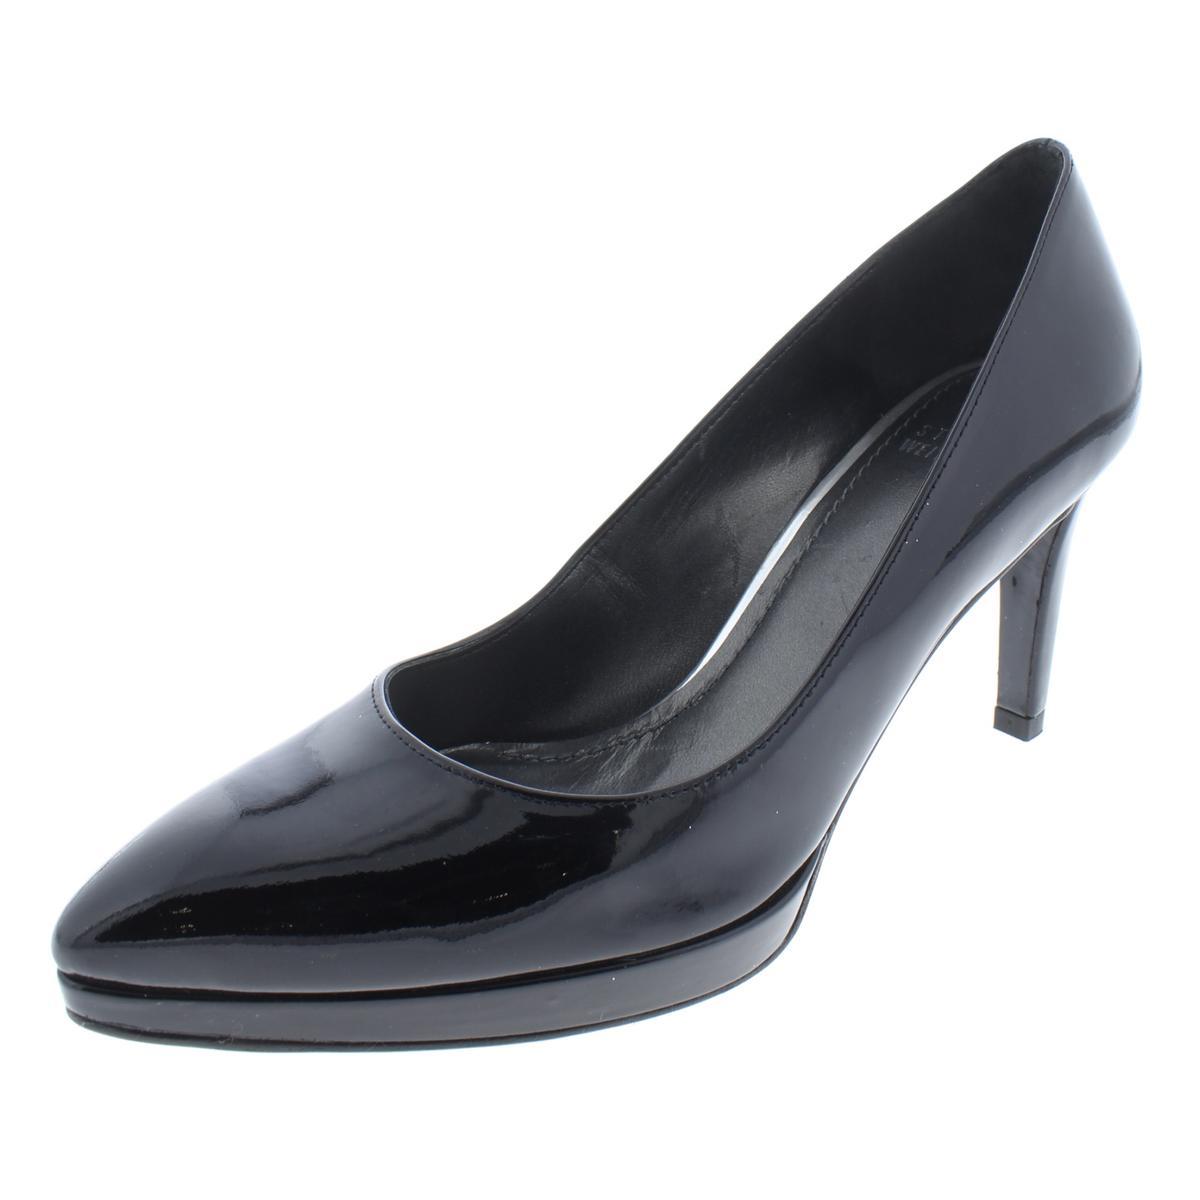 Stuart Weitzman Weitzman Weitzman para Mujer Vestido Negro Platón Tacones Zapatos 8 Medio (B, M) BHFO 5439  mejor marca